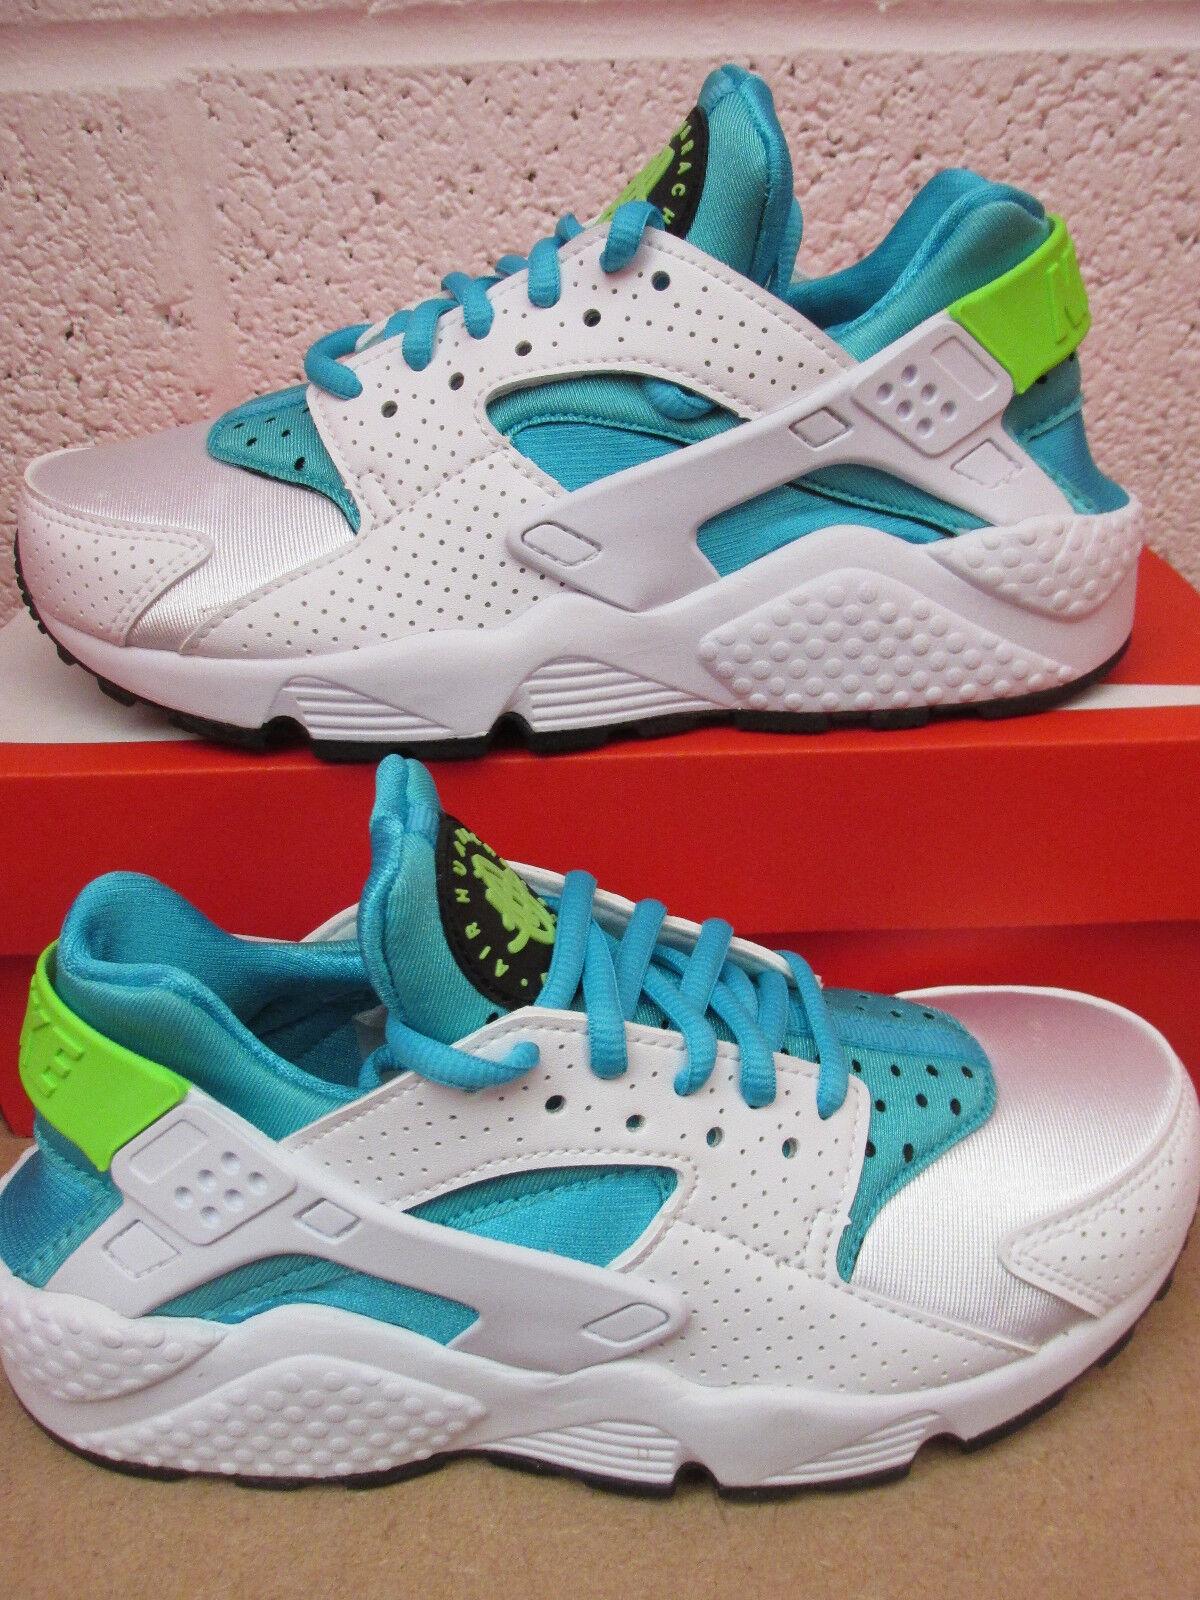 Nike Donna Air Huarache Scarpe Sportive 634835 109 Scarpe da Tennis